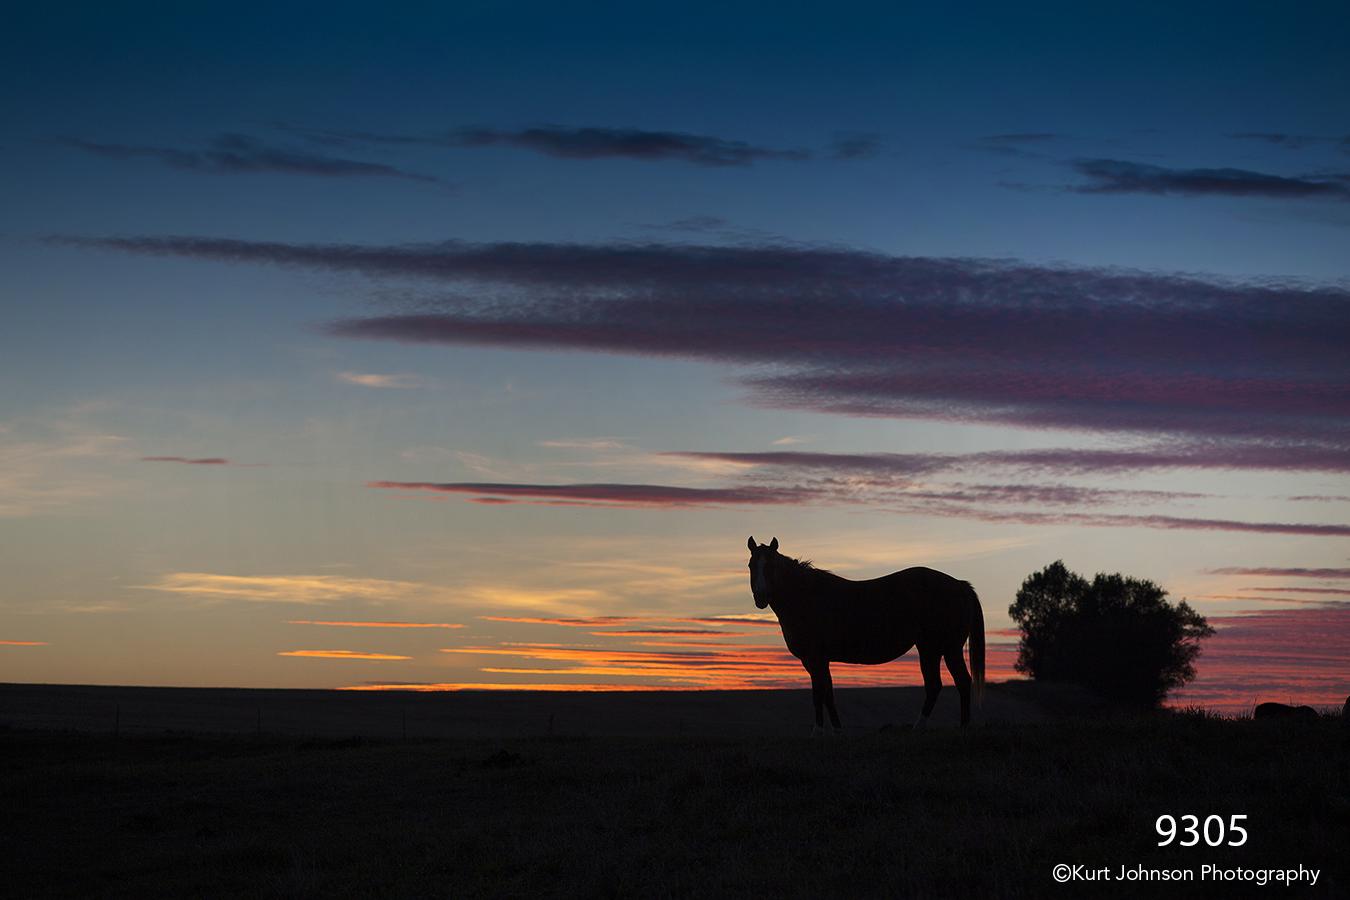 sunset wildlife horse clouds silhouette landscape